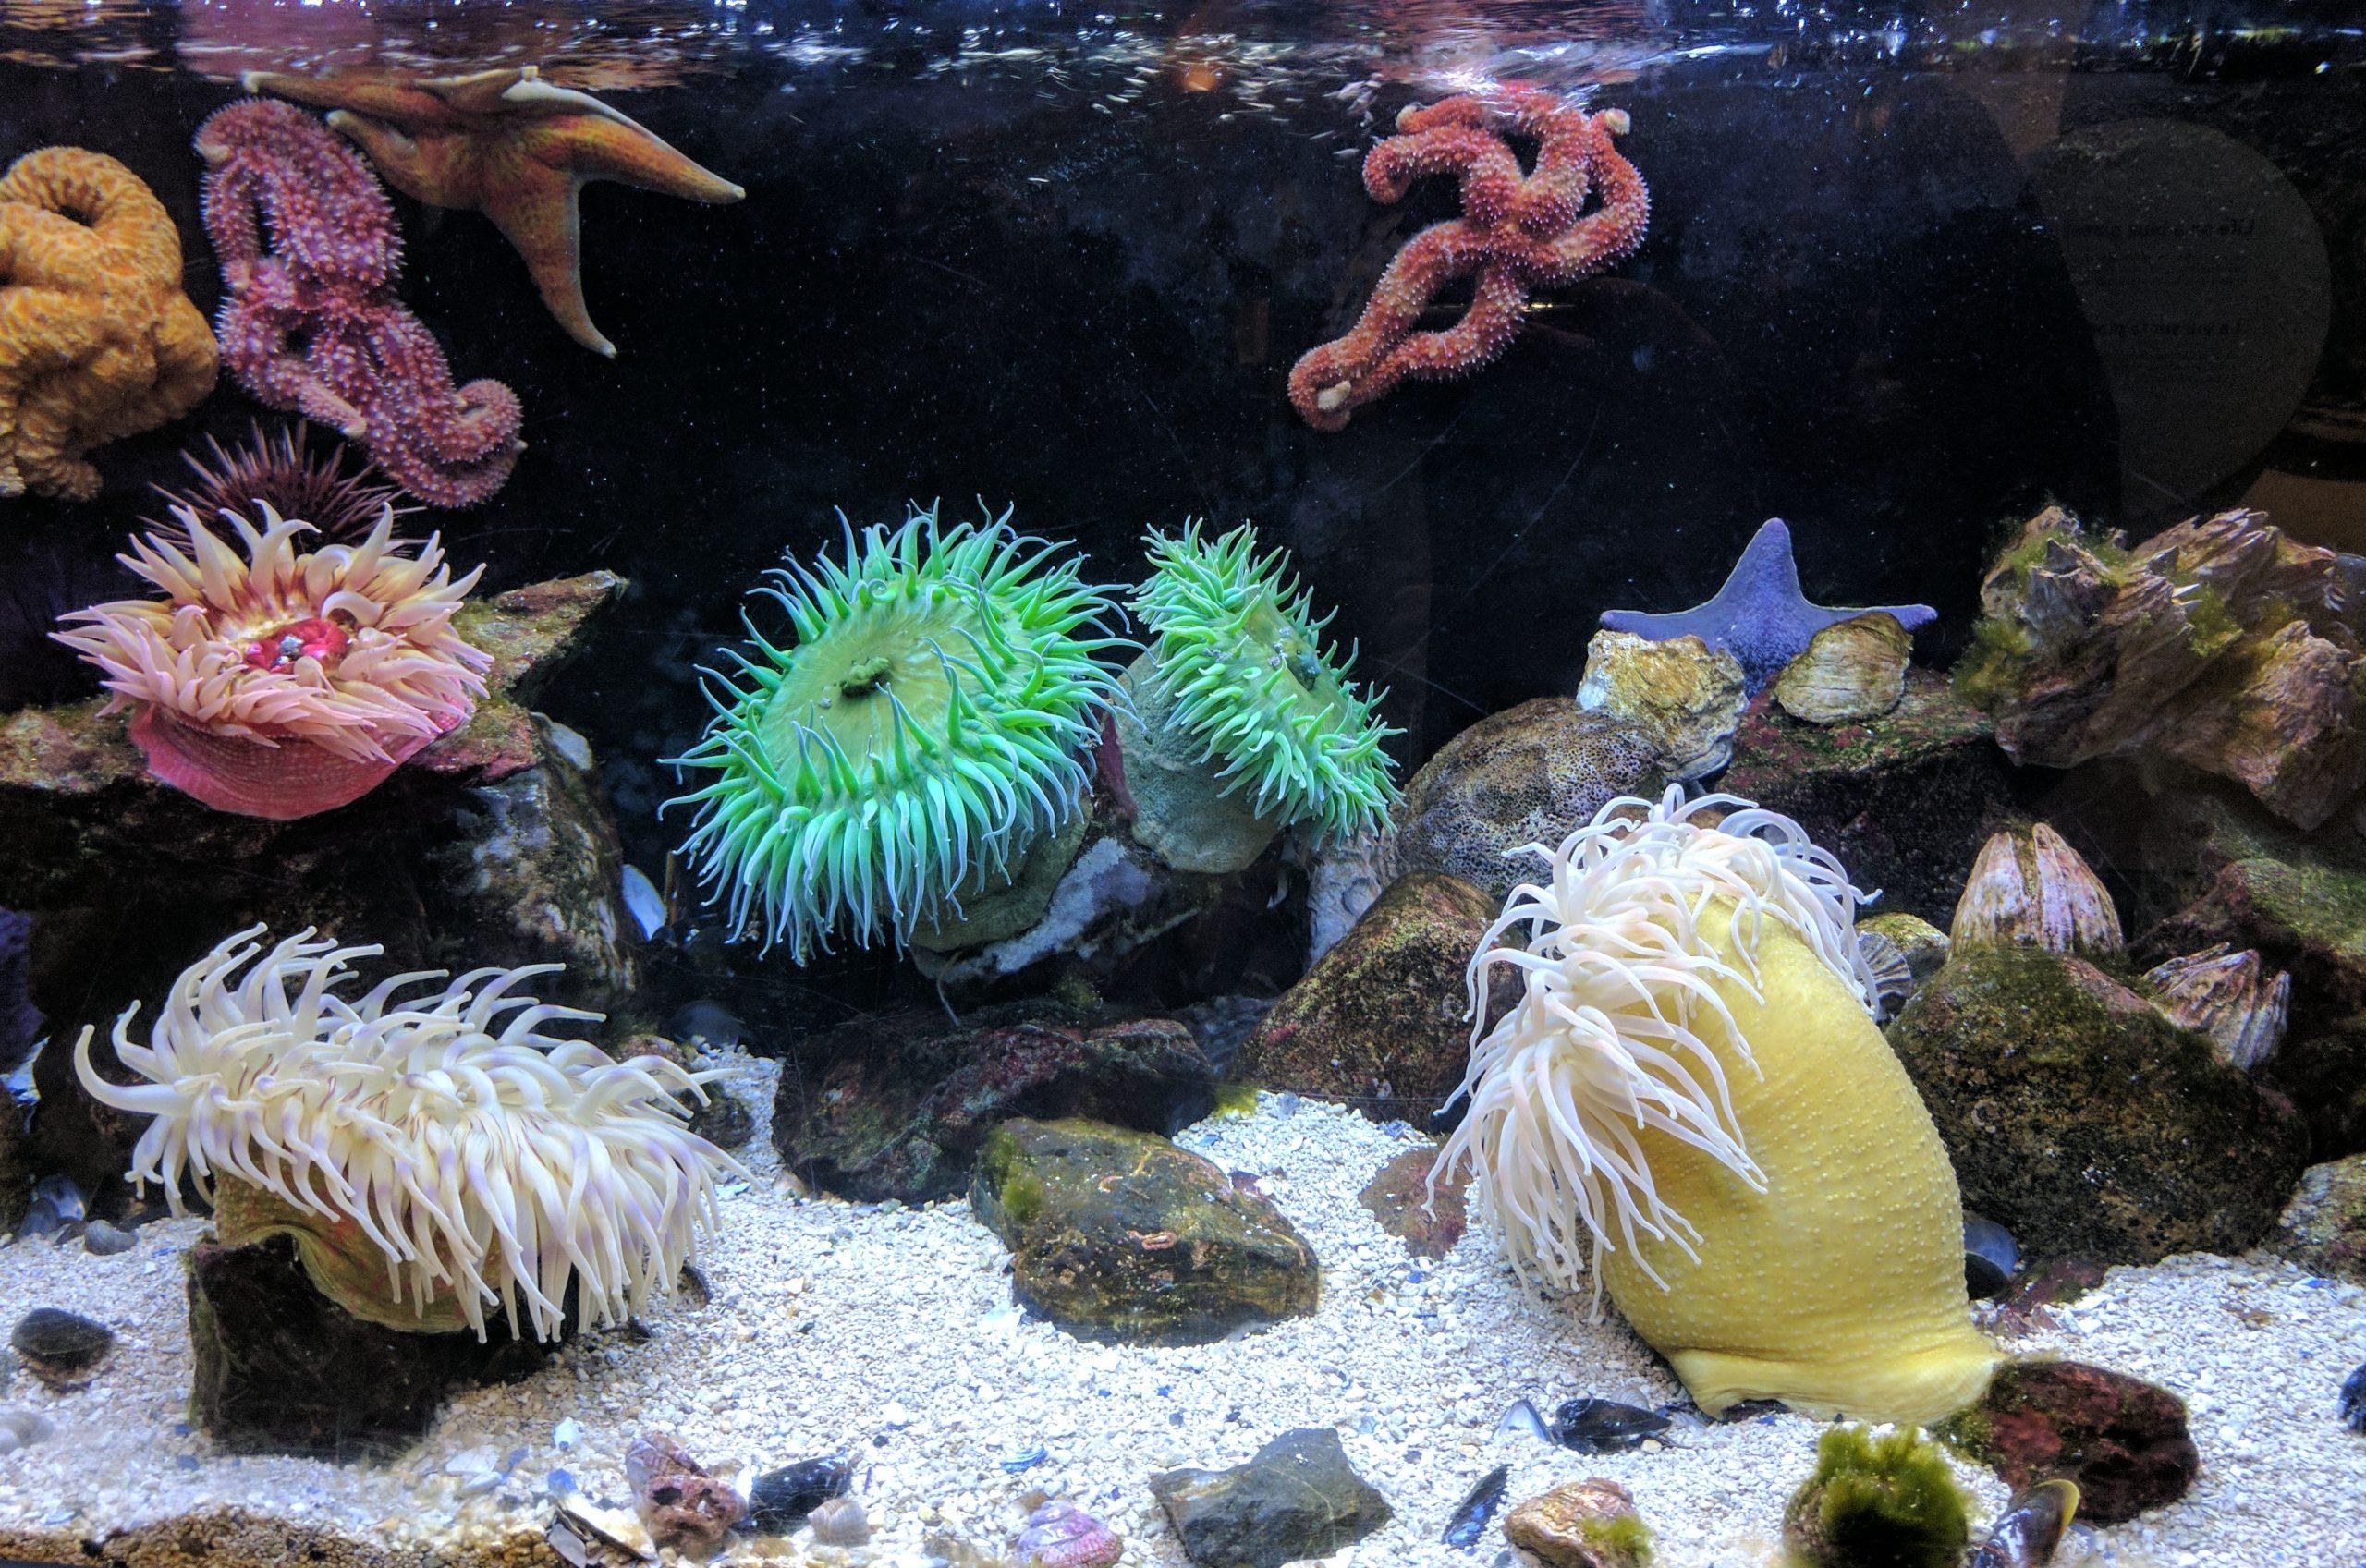 photography of aquarium with corals